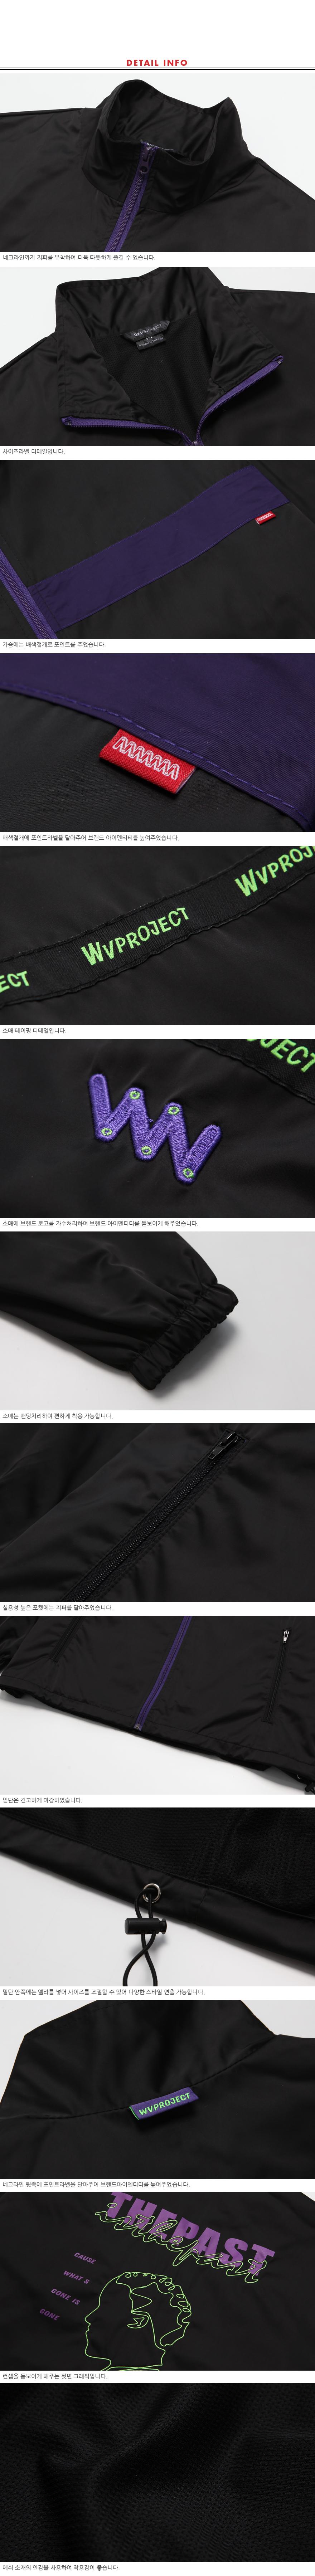 YRJK7202_detail_black.jpg